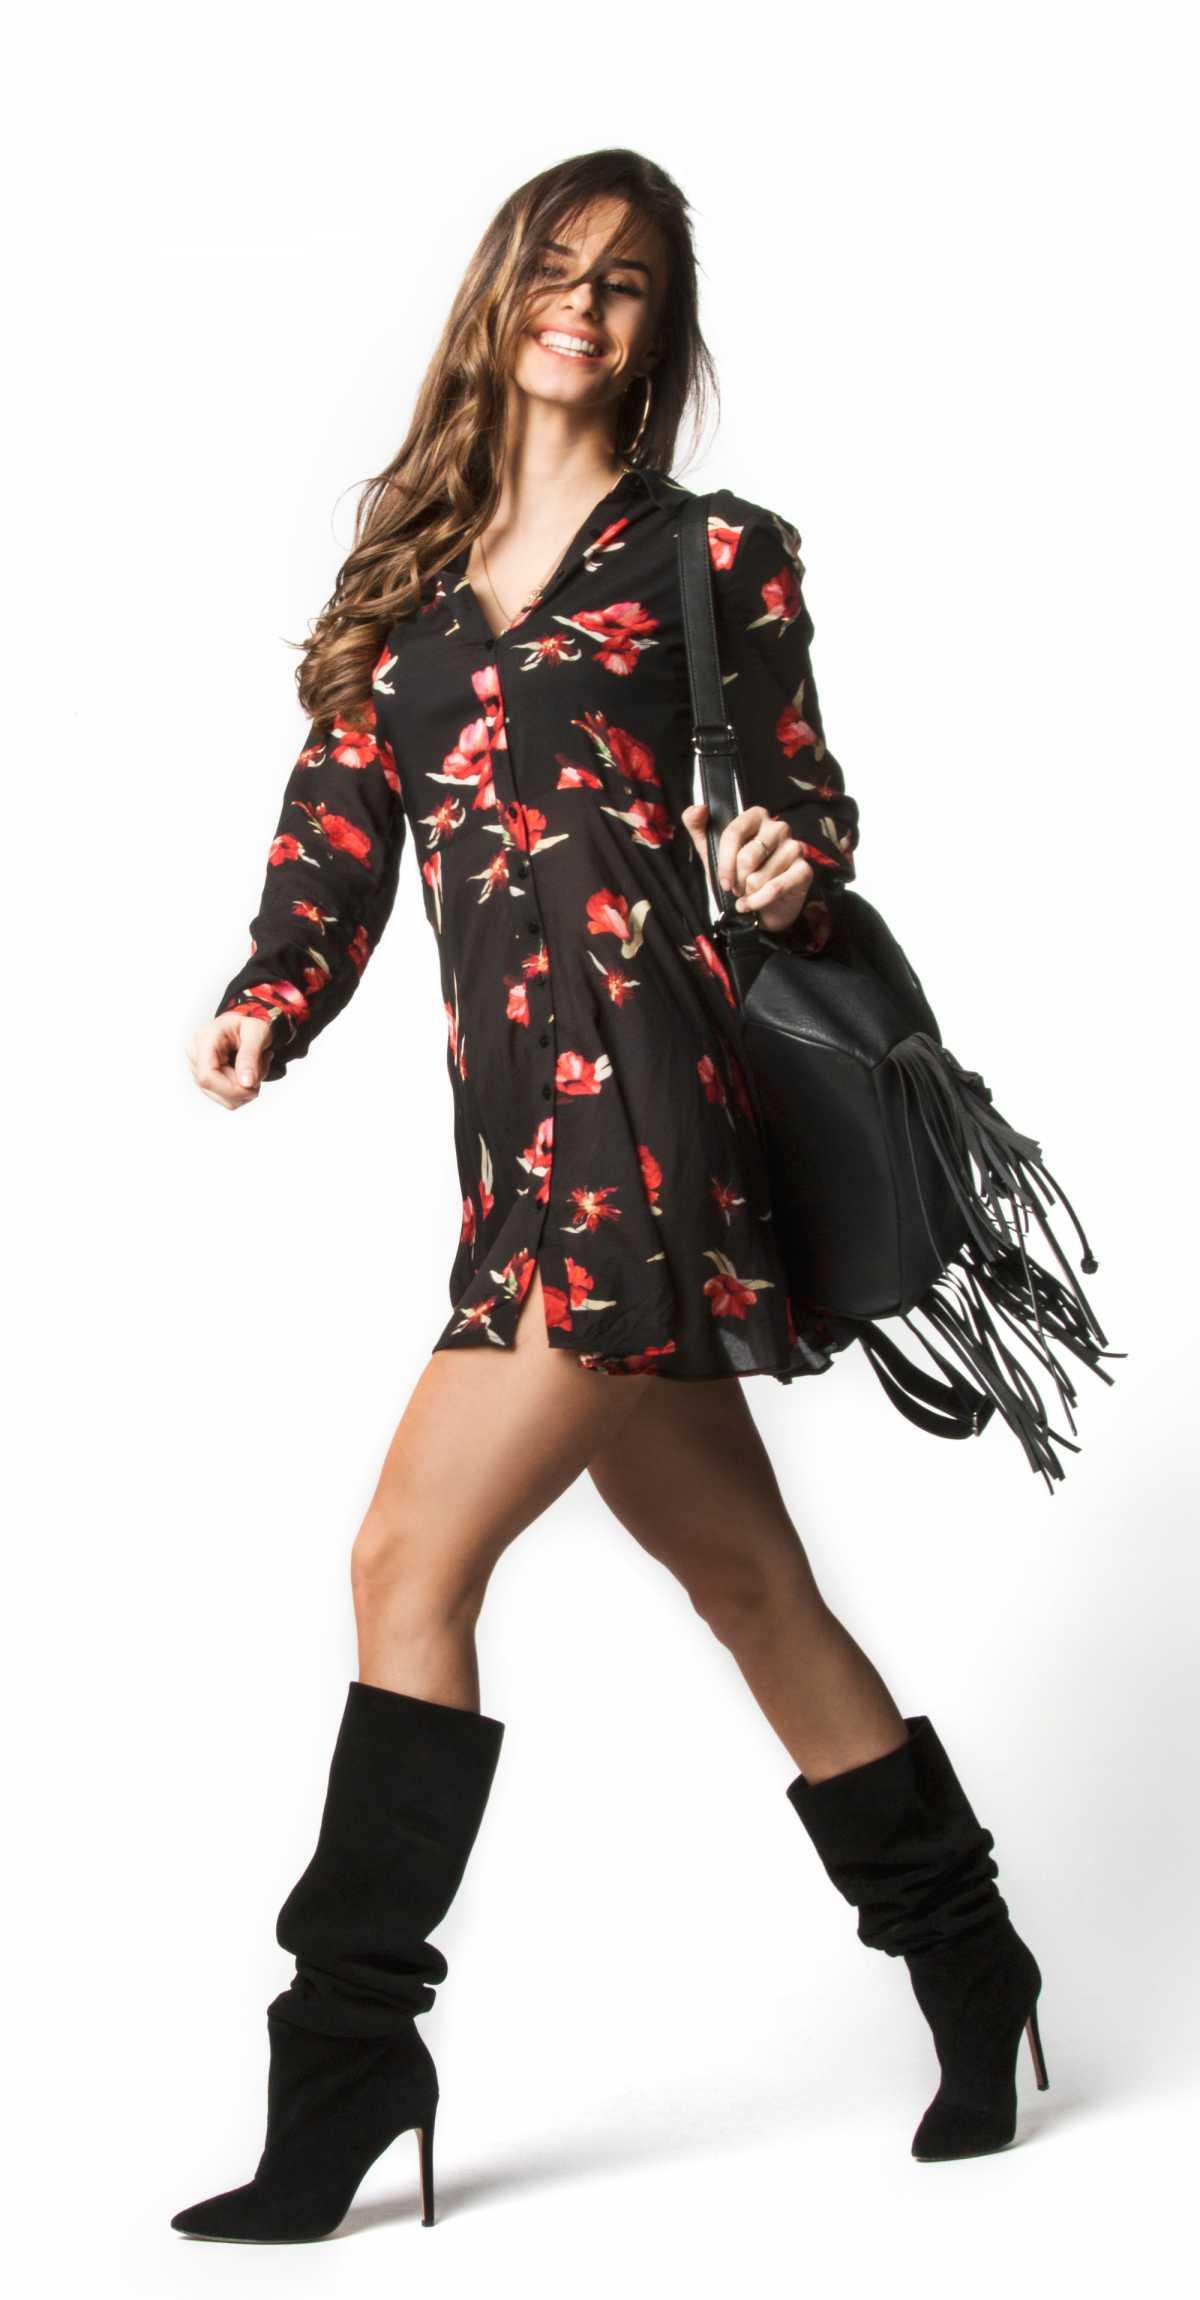 vestido floral preto com bolsa de franjas